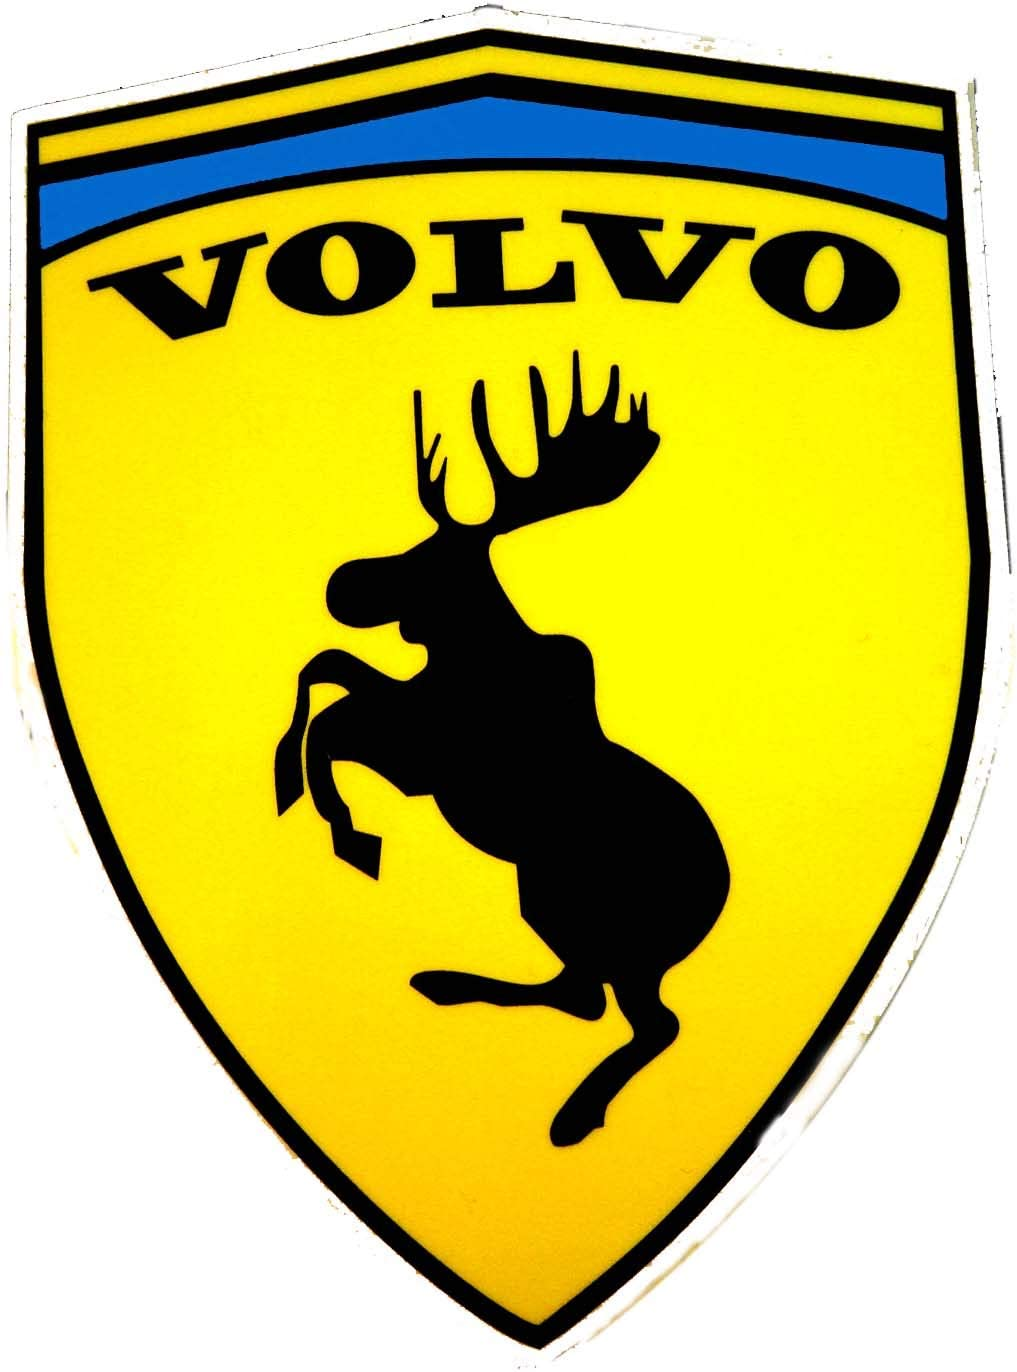 Folien1x1 2 Stk Volvo Ferrari Elch Sticker Fun Aufkleber Ca 10 6 Cm X 7 7 Cm Auto